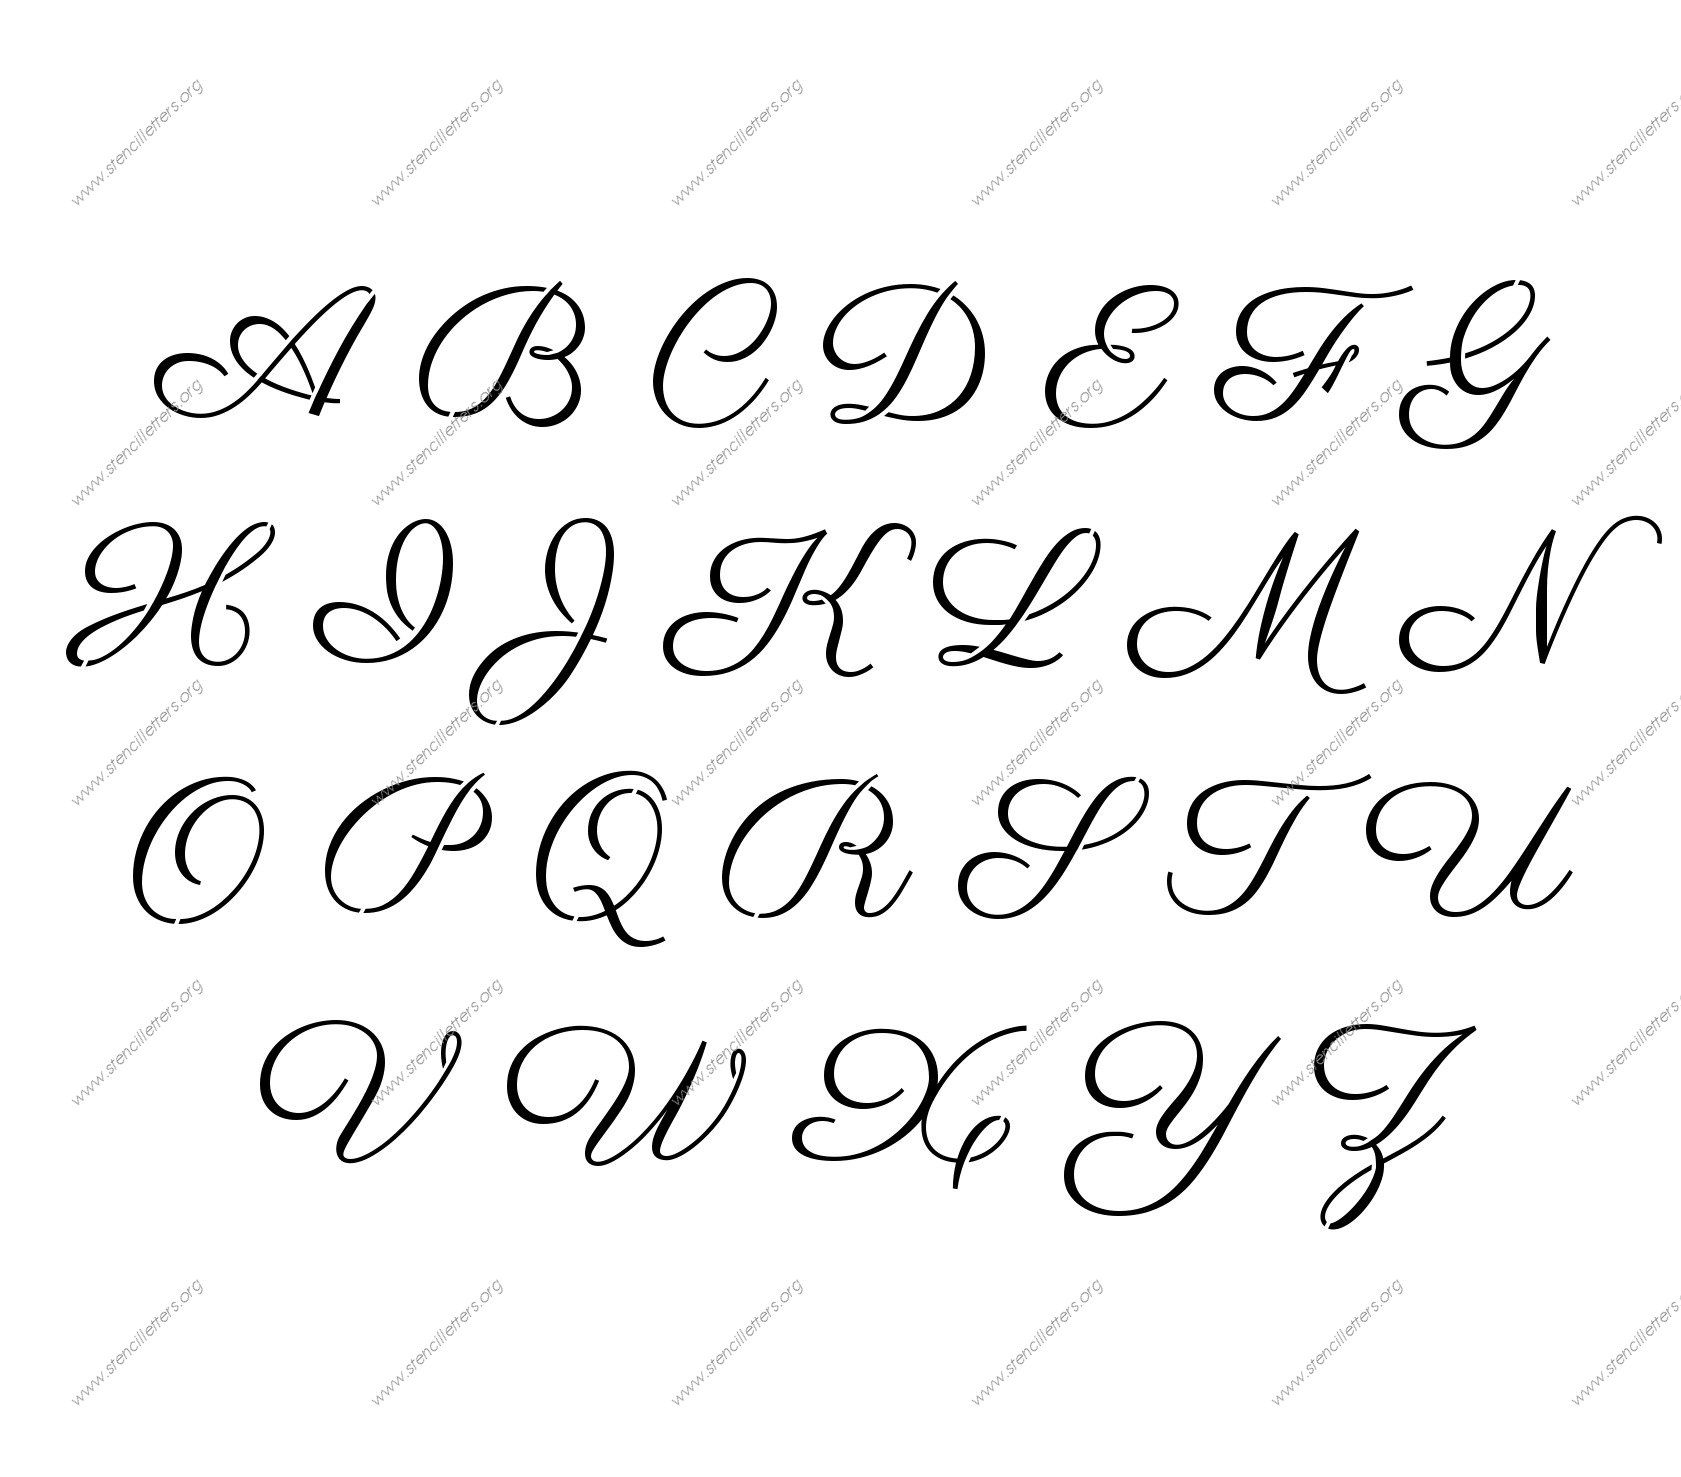 Free Printable Alphabet Stencil Letters Template | Art & Crafts - Free Printable Letter Stencils